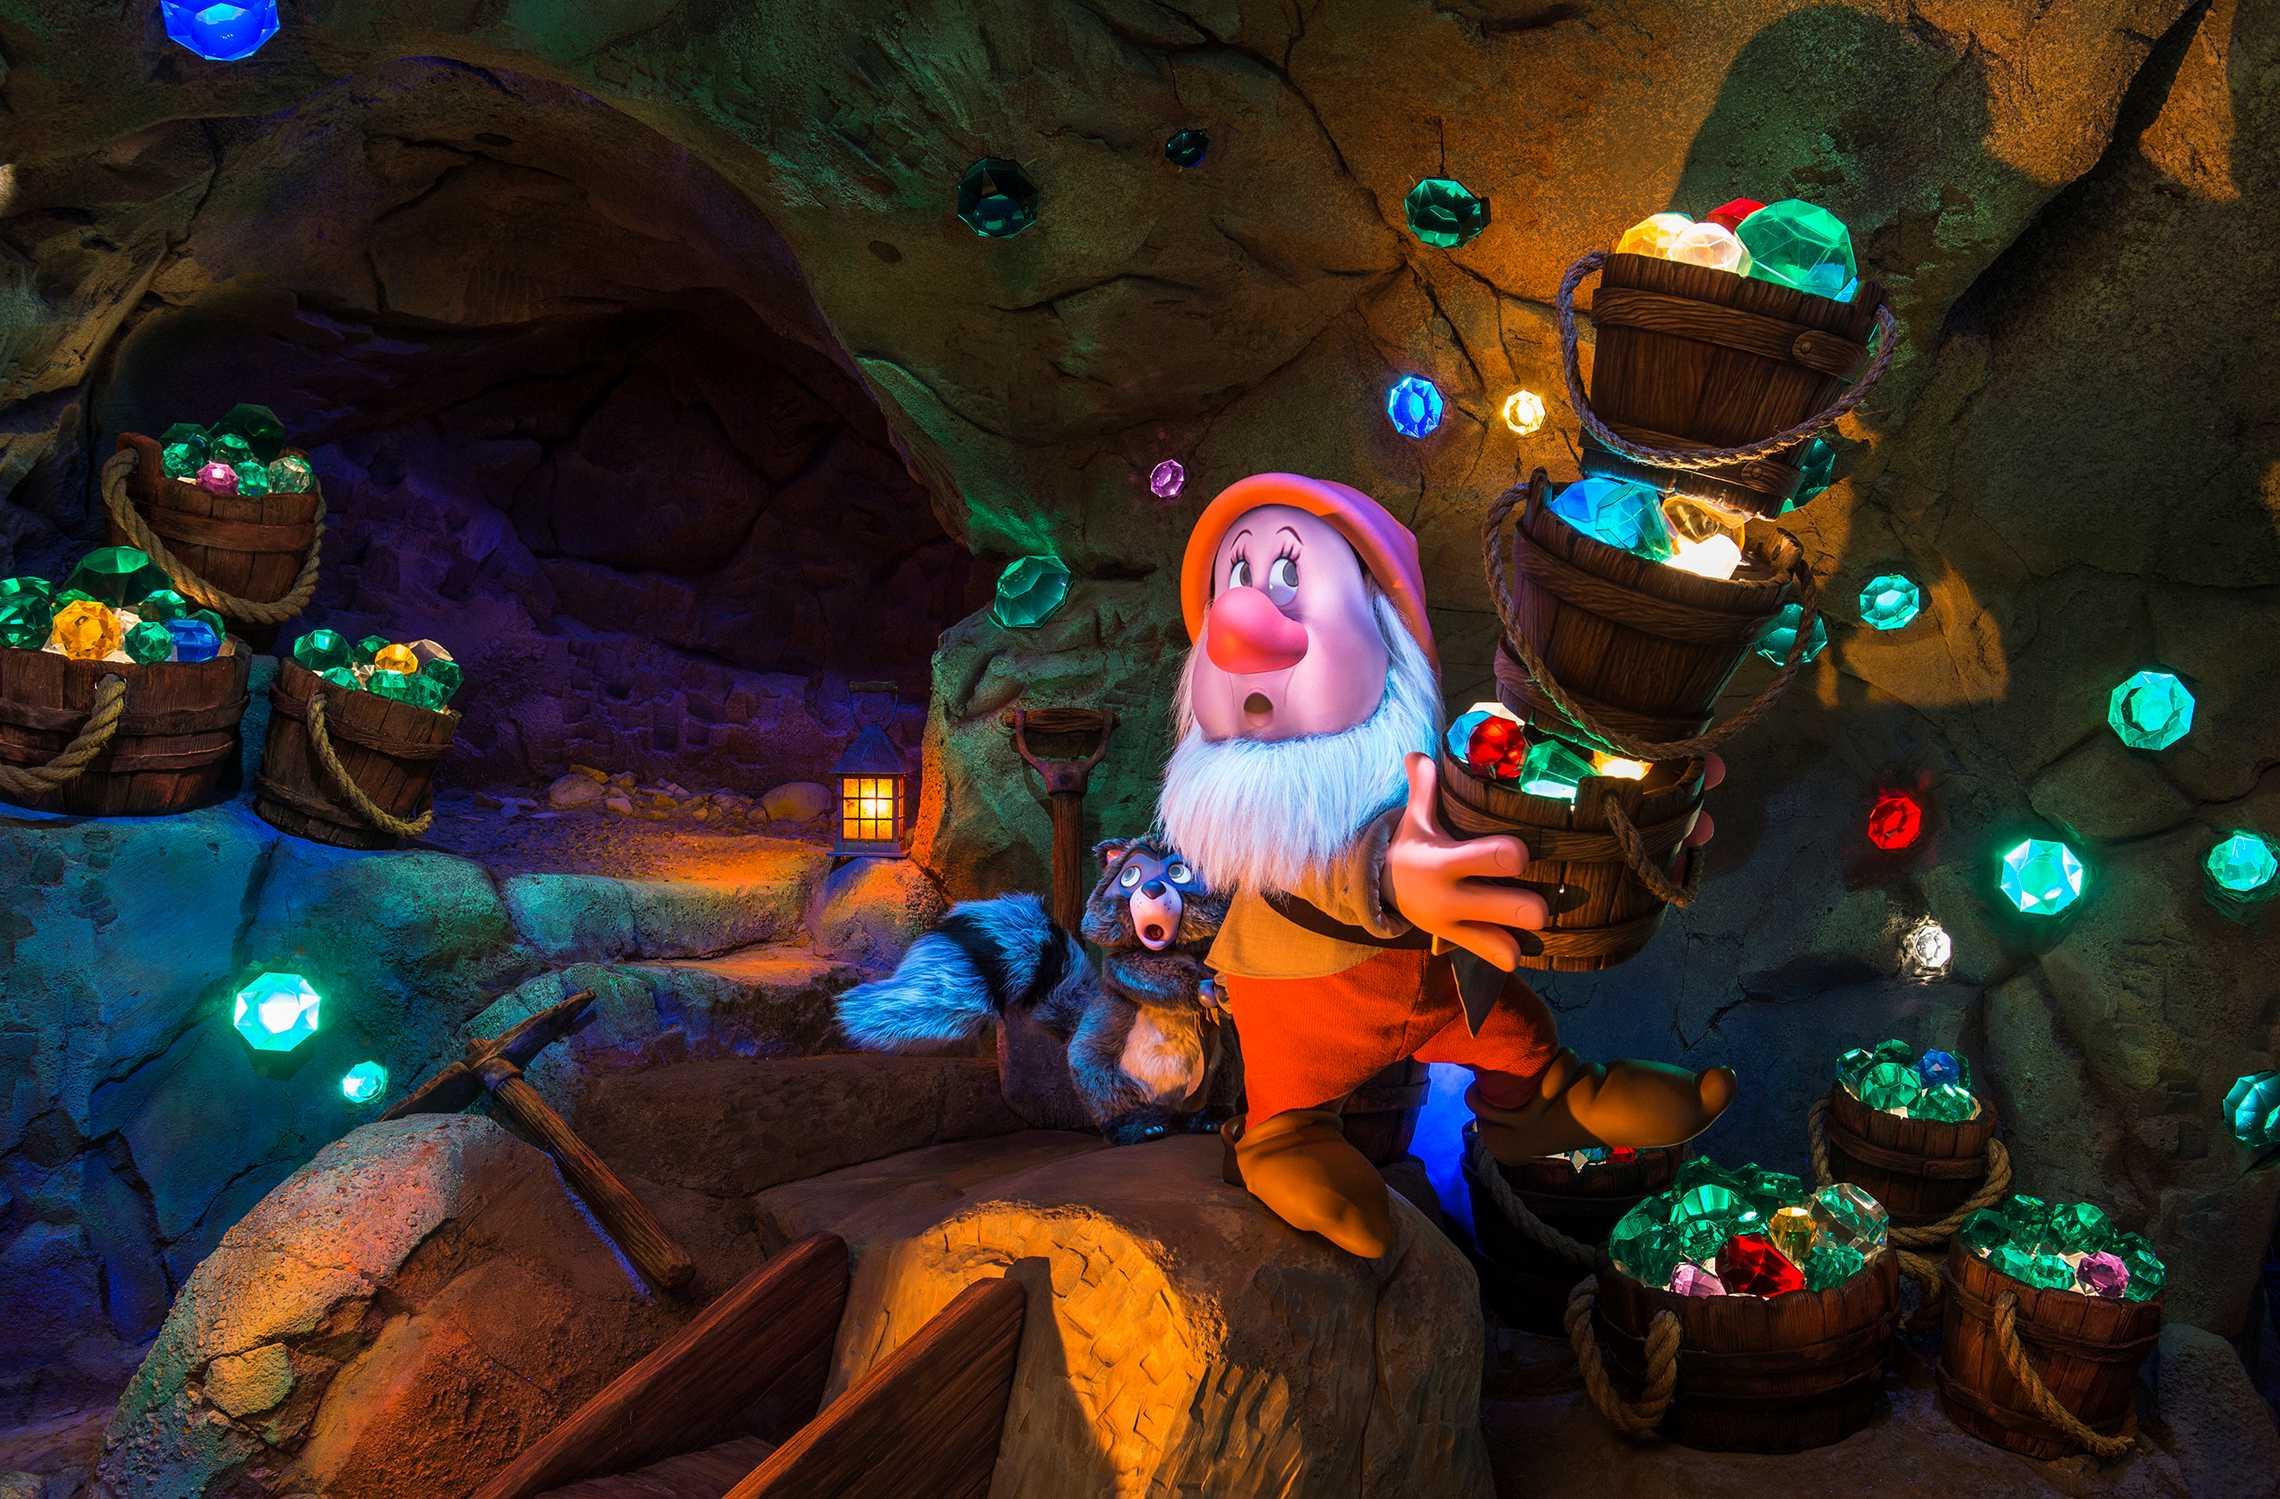 Seven Dwarfs Mine Train animatronics